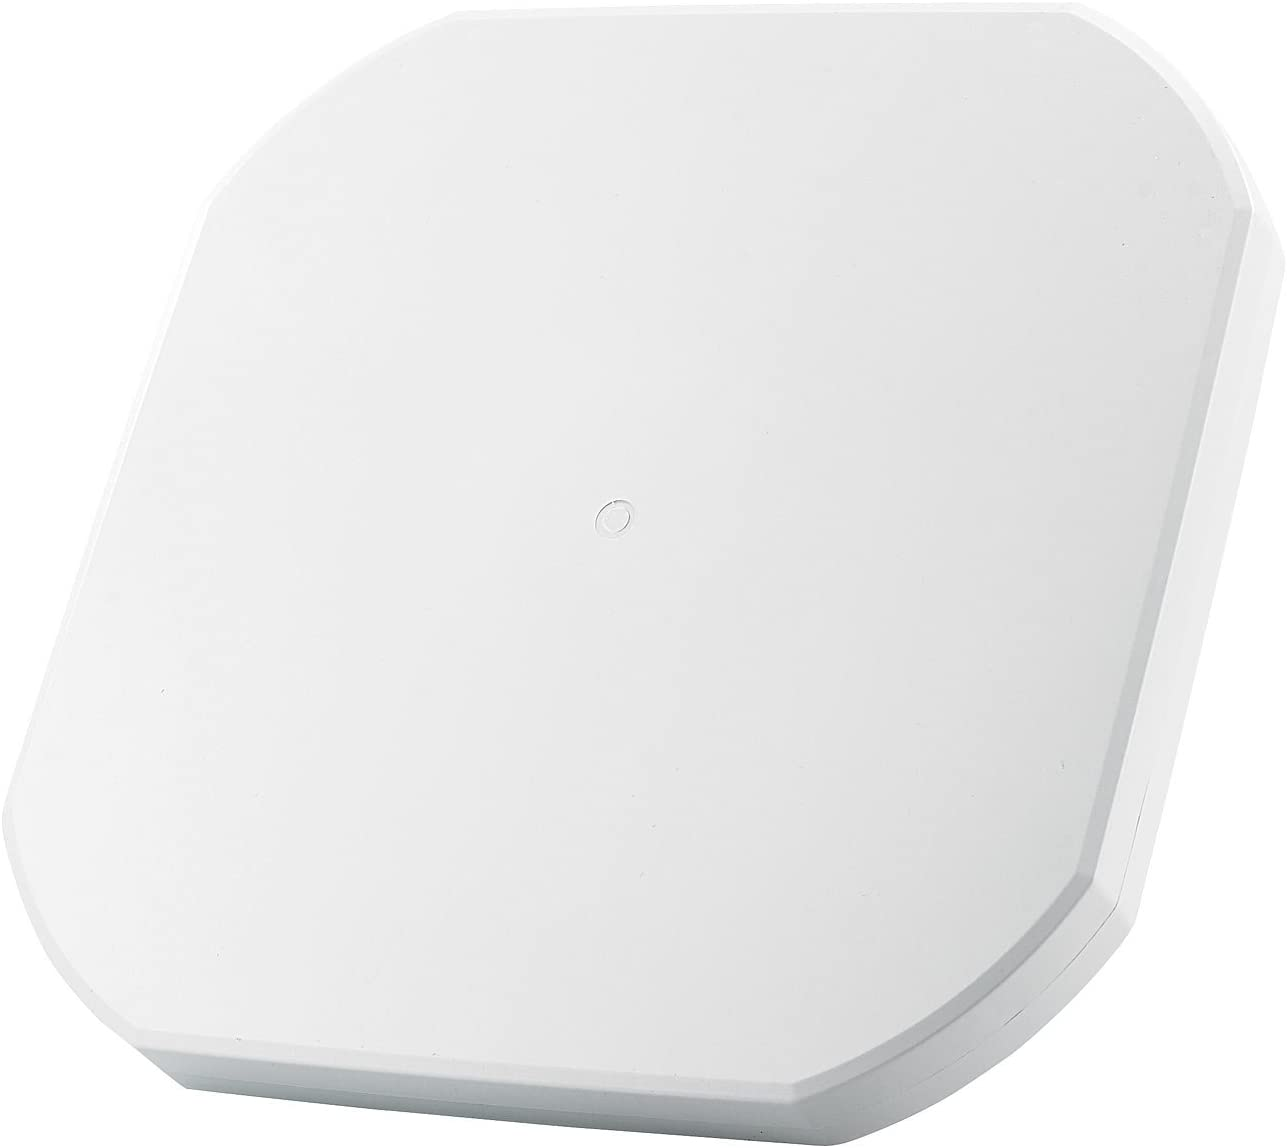 esoSAT Antena parabólica: Antena satelital Plana FA-265.Sat con Doble Digital LNB (Pequeños Antena parabólica)